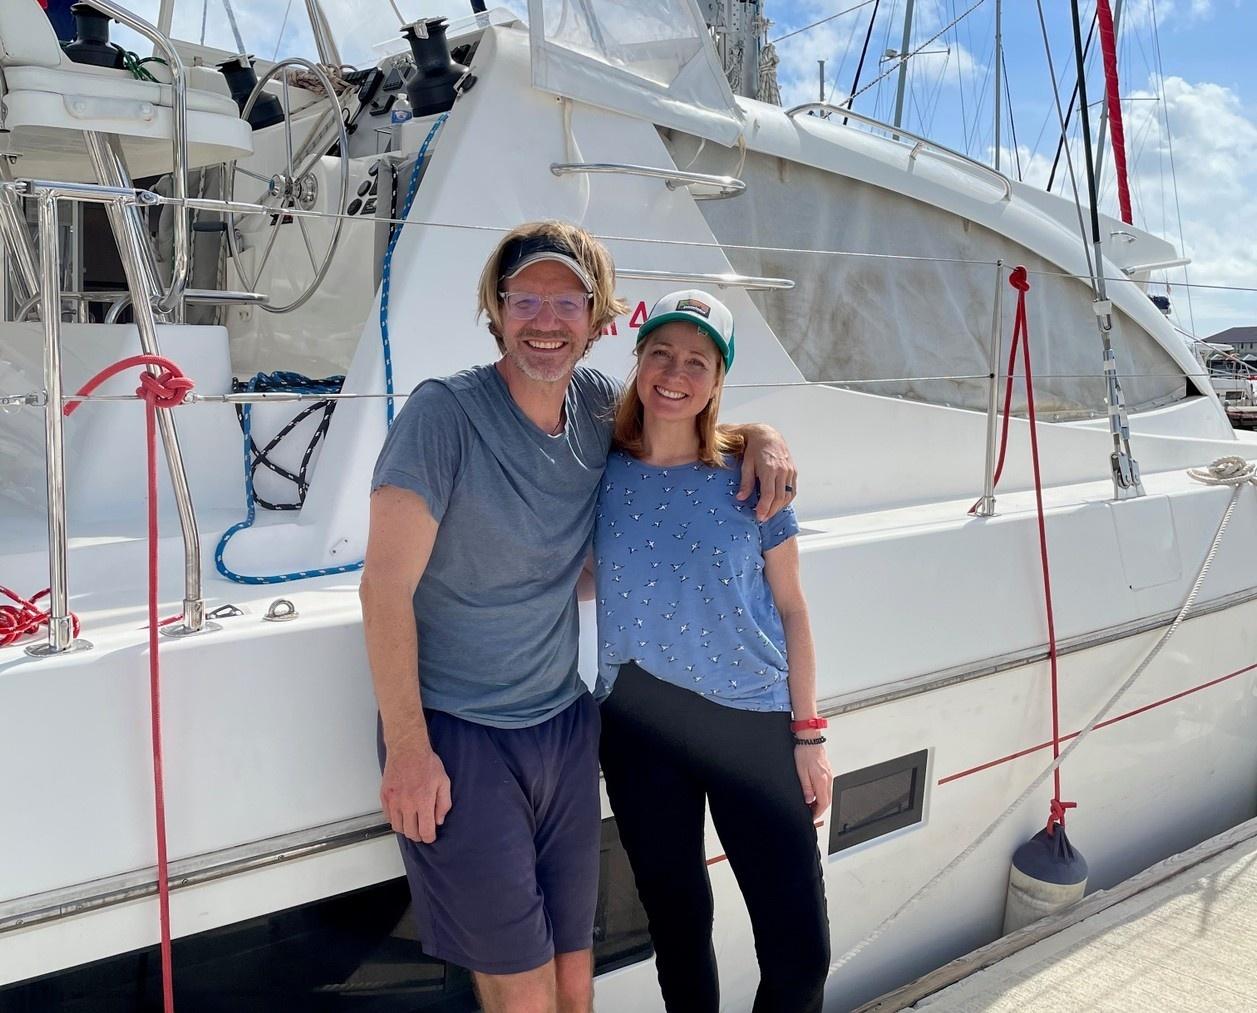 Erik Orton, Emily Orton, boat, marina, dockside, sailboat, adventure, travel, learning, growing, retreat, sail